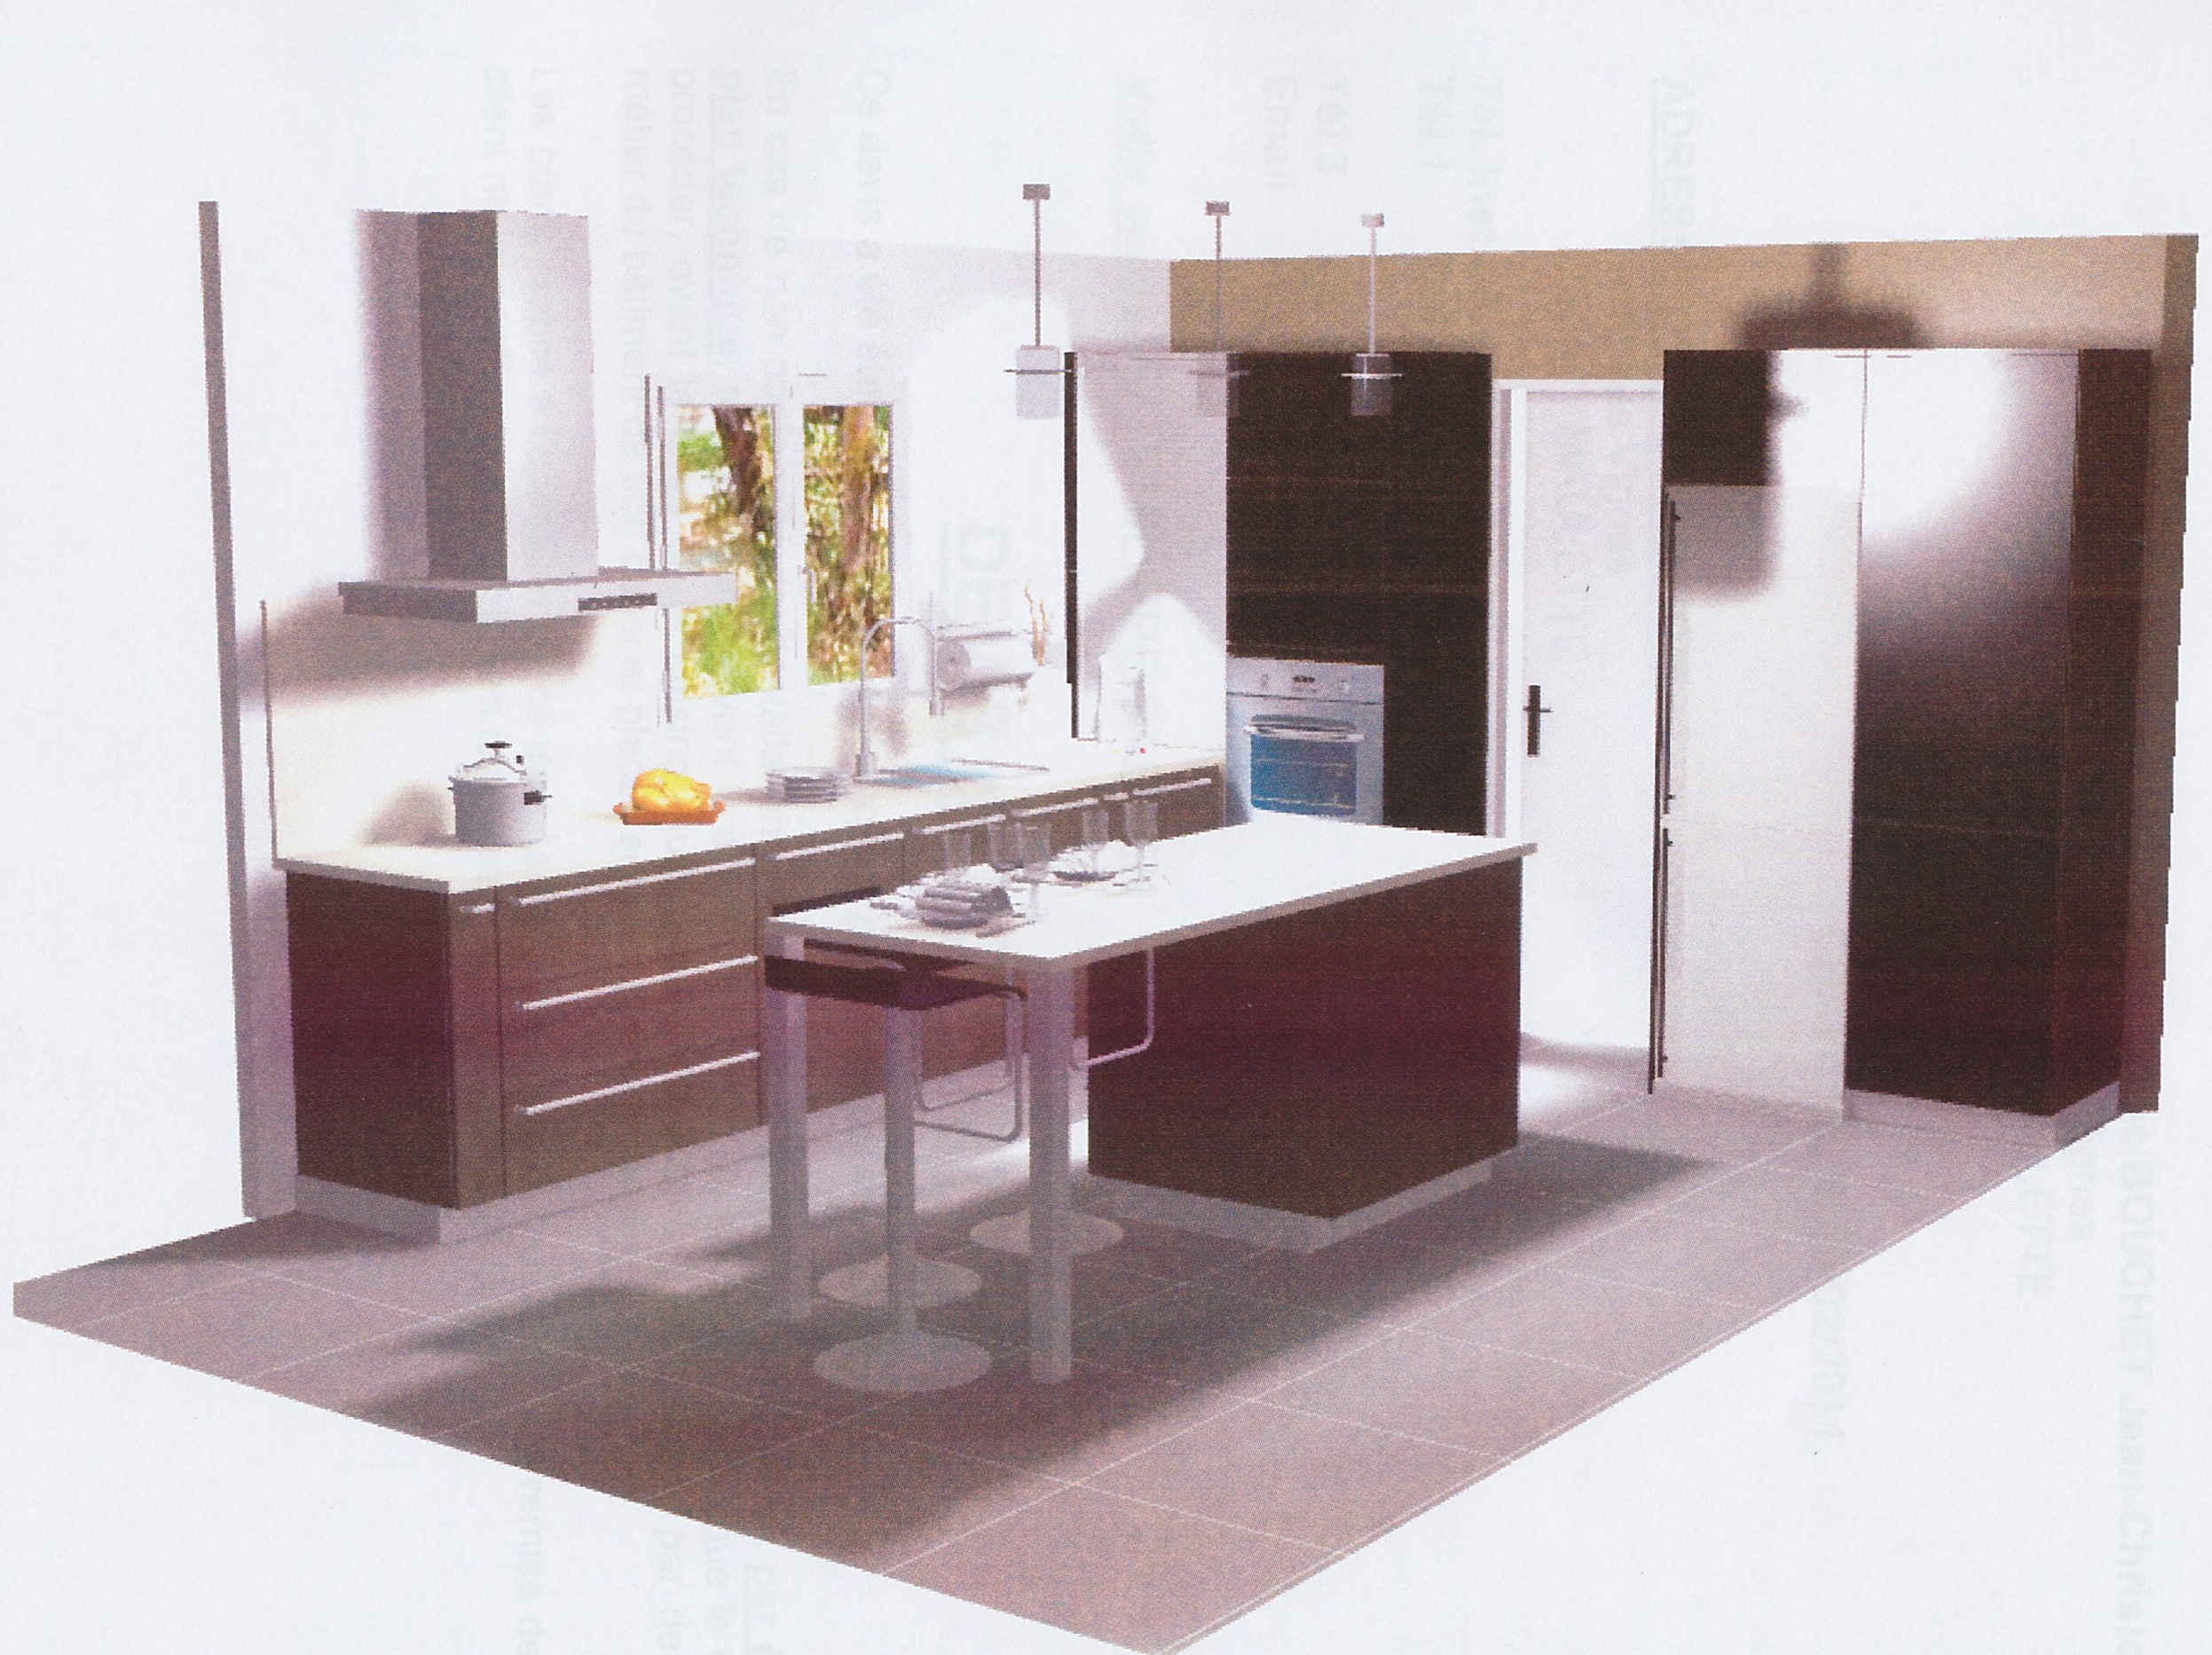 plan amenagement cuisine 10m2